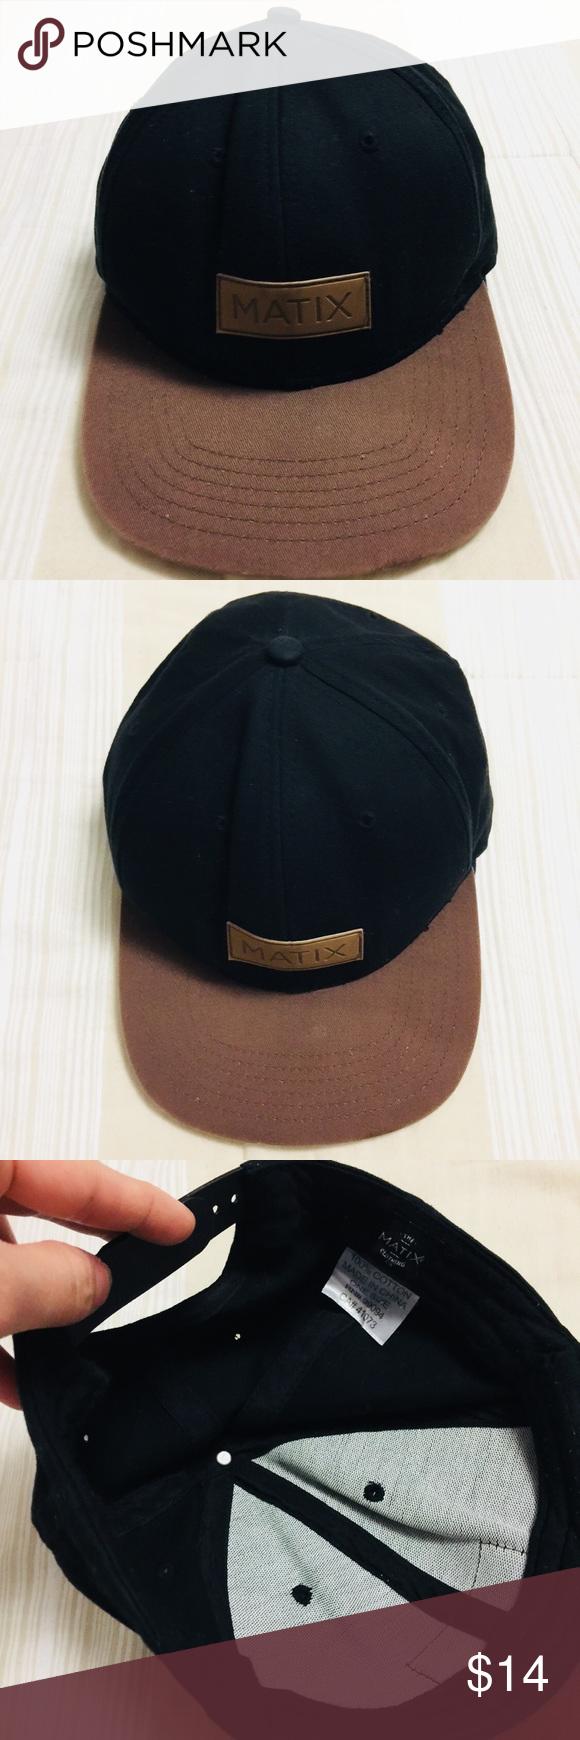 c7cc20304 Men's black/brown matix SnapBack hat. Used. Men's black/brown matix ...